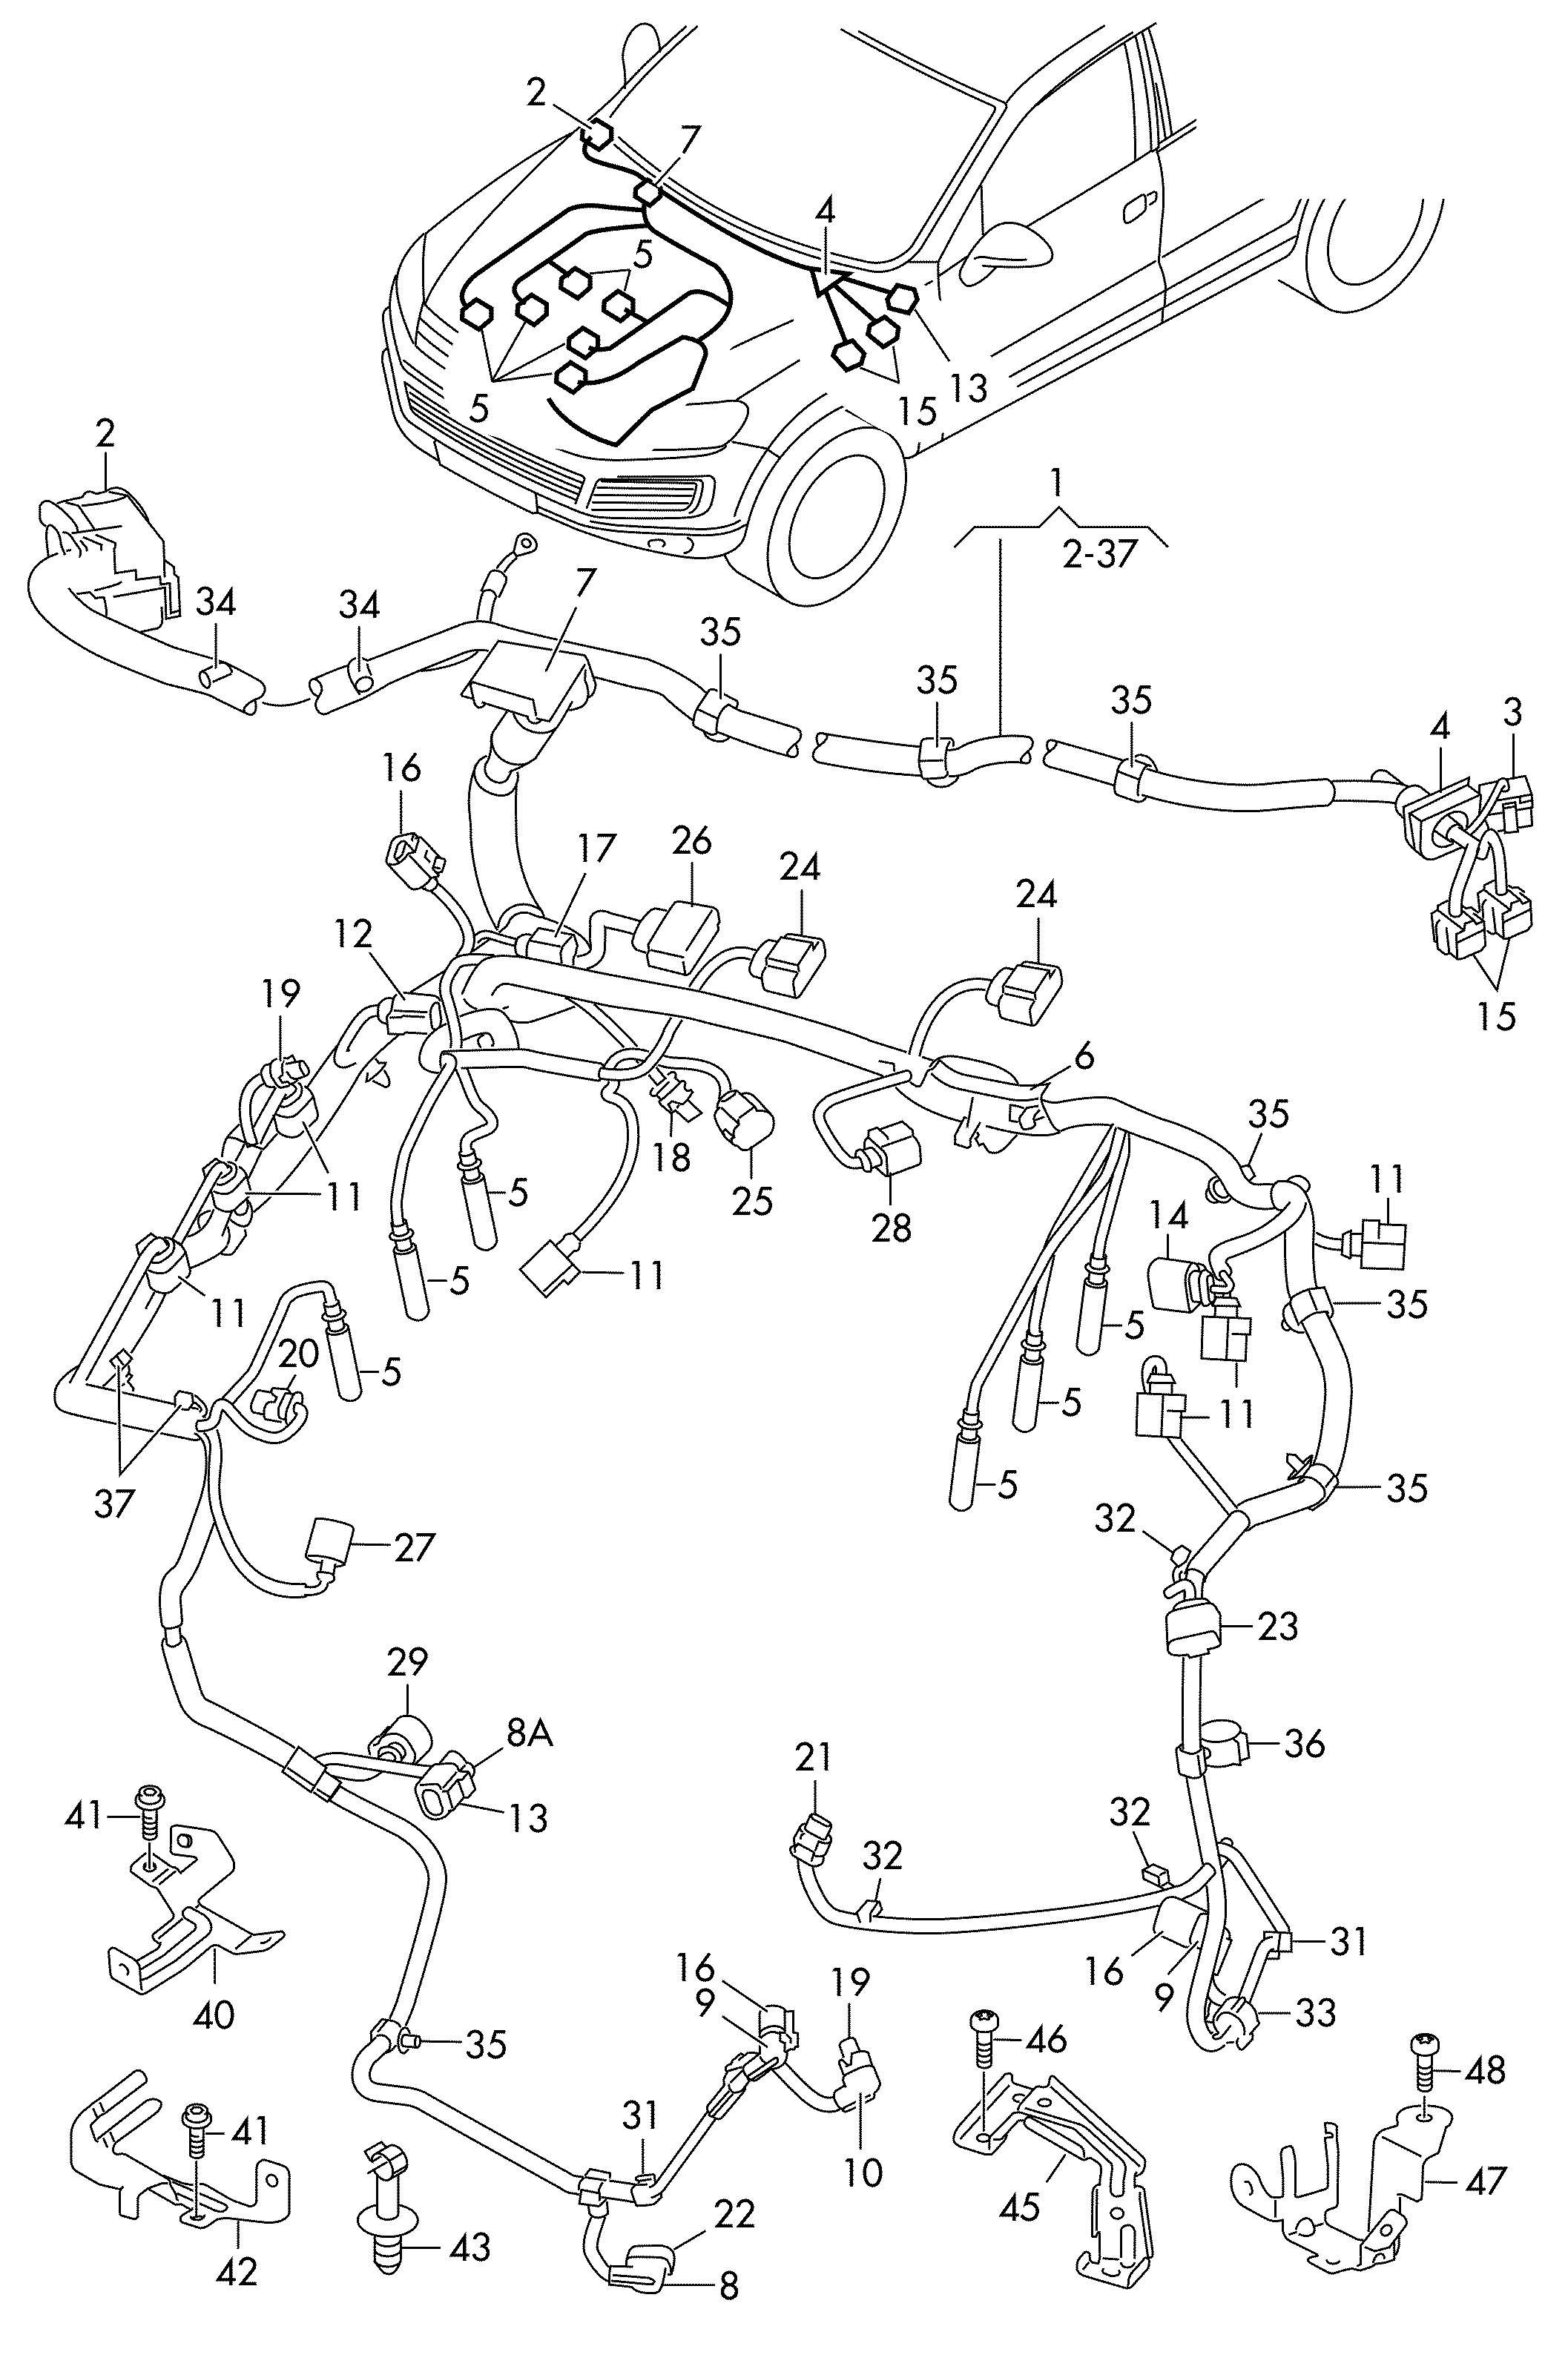 2011 volkswagen jetta sel fuse location diagrams 2011